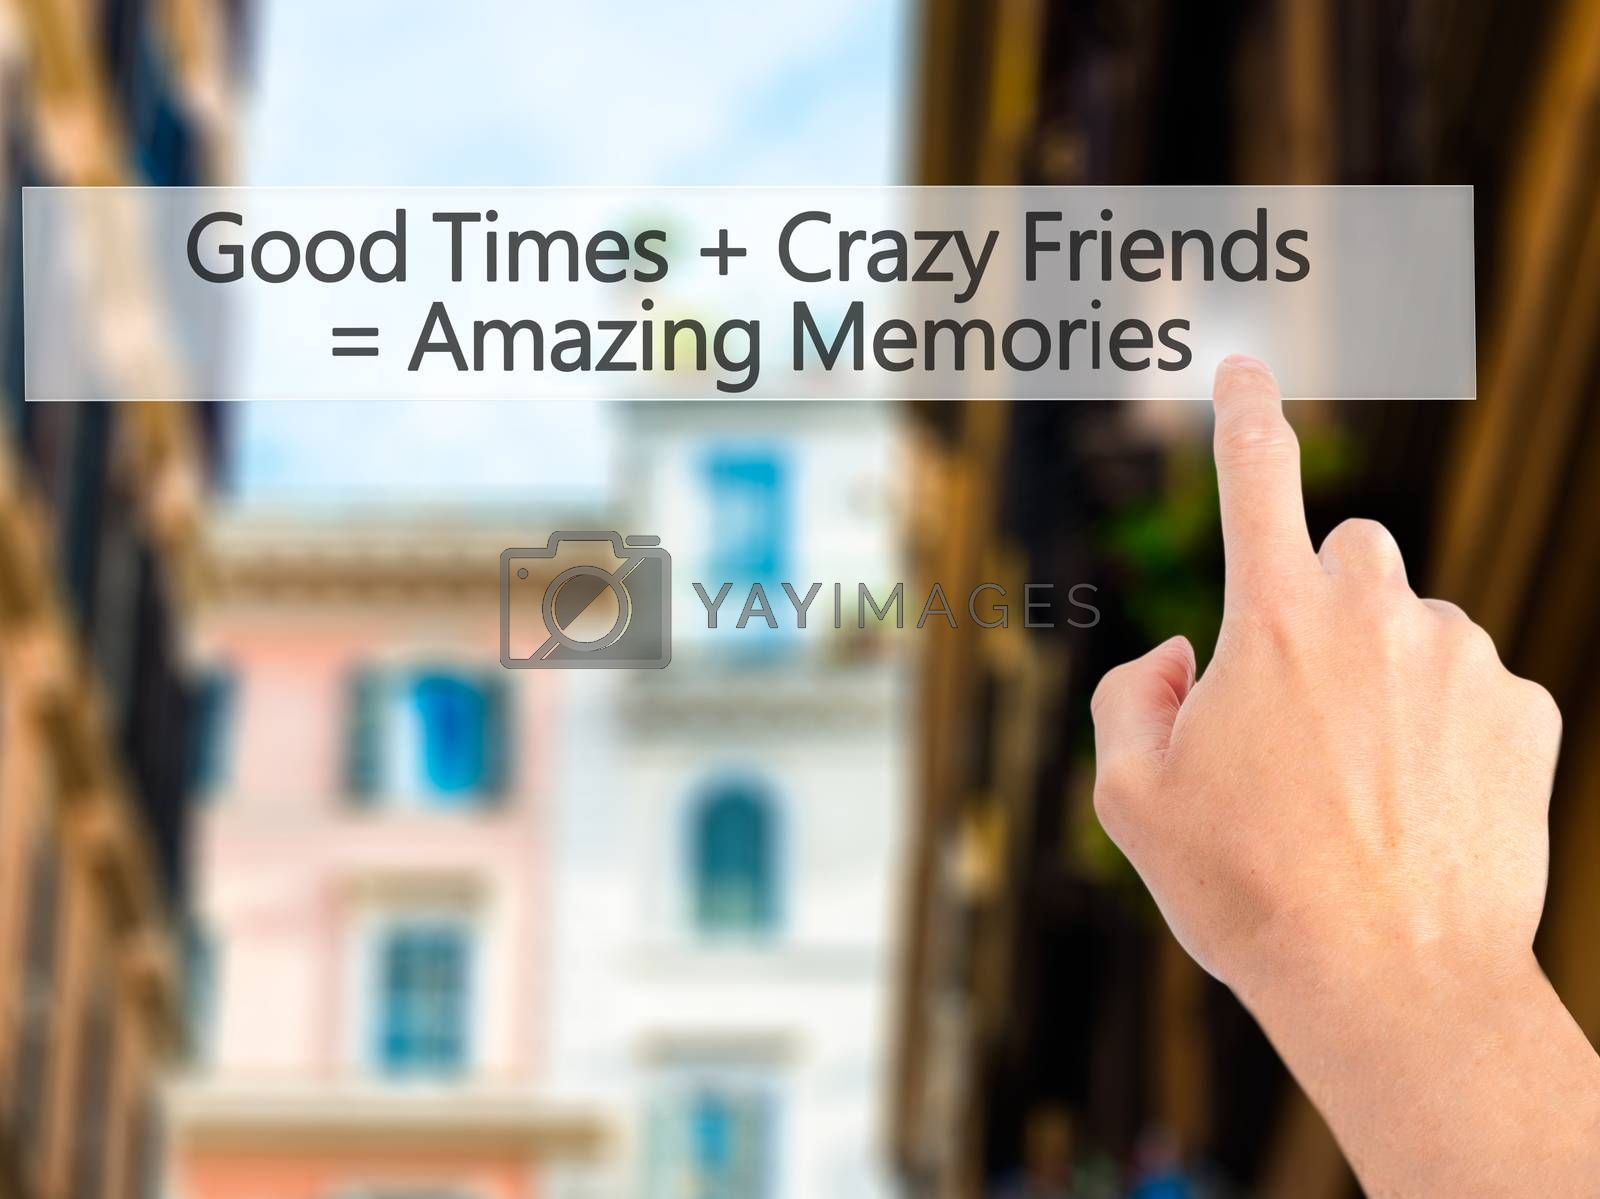 Good Times  Crazy Friends  Amazing Memories - Hand pressing a bu by netsay.net